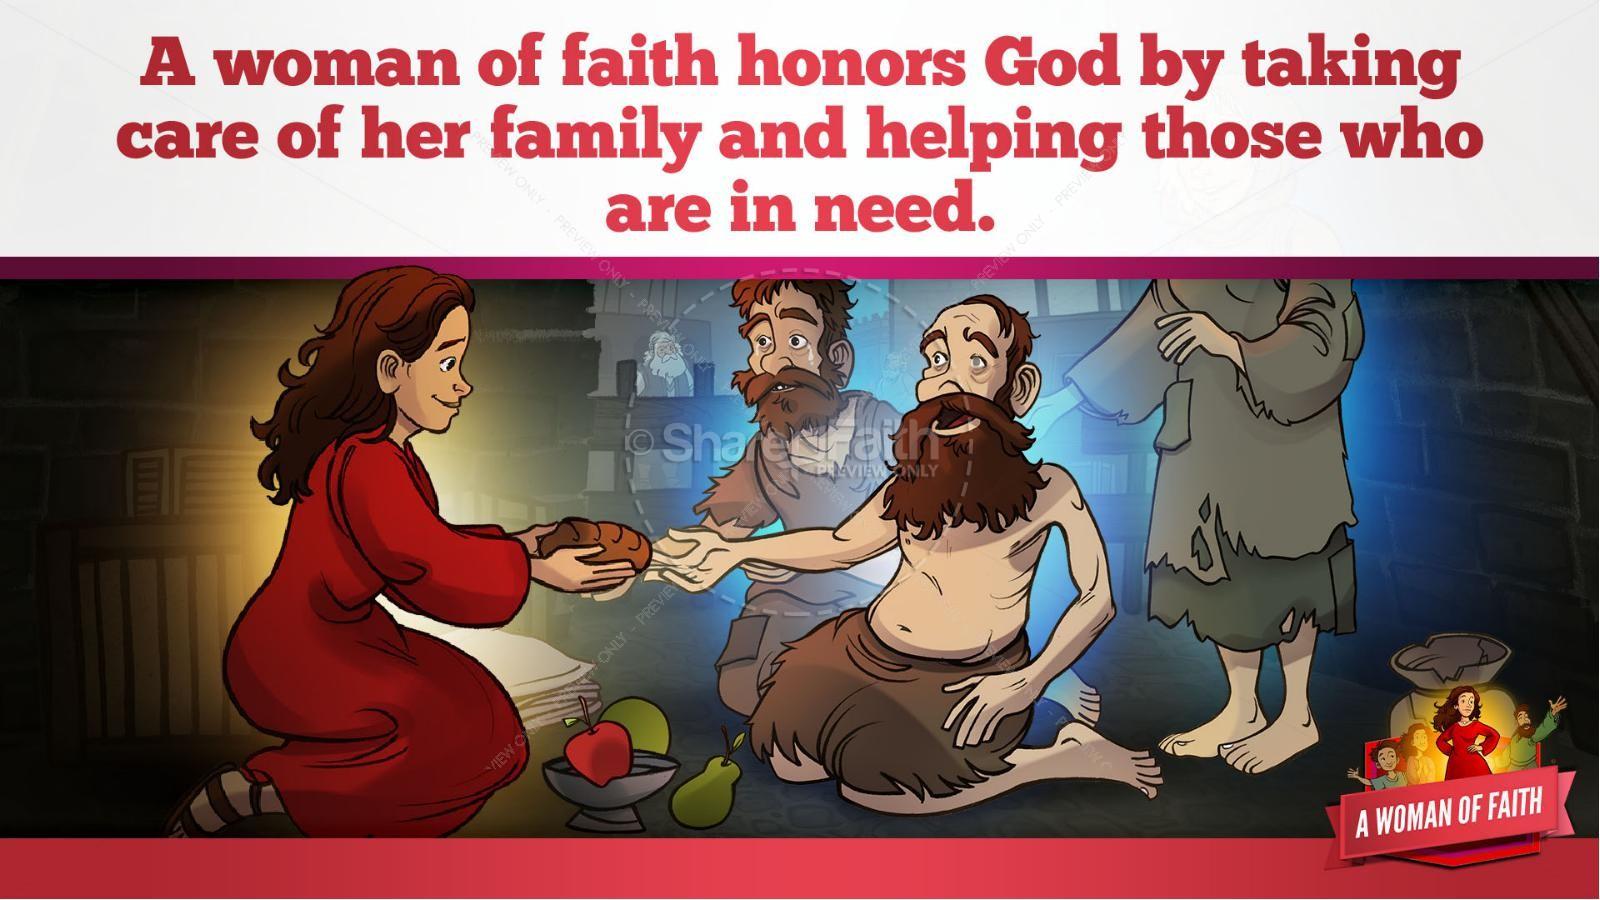 Proverbs 31 A Woman of Faith Kids Bible Story | slide 24